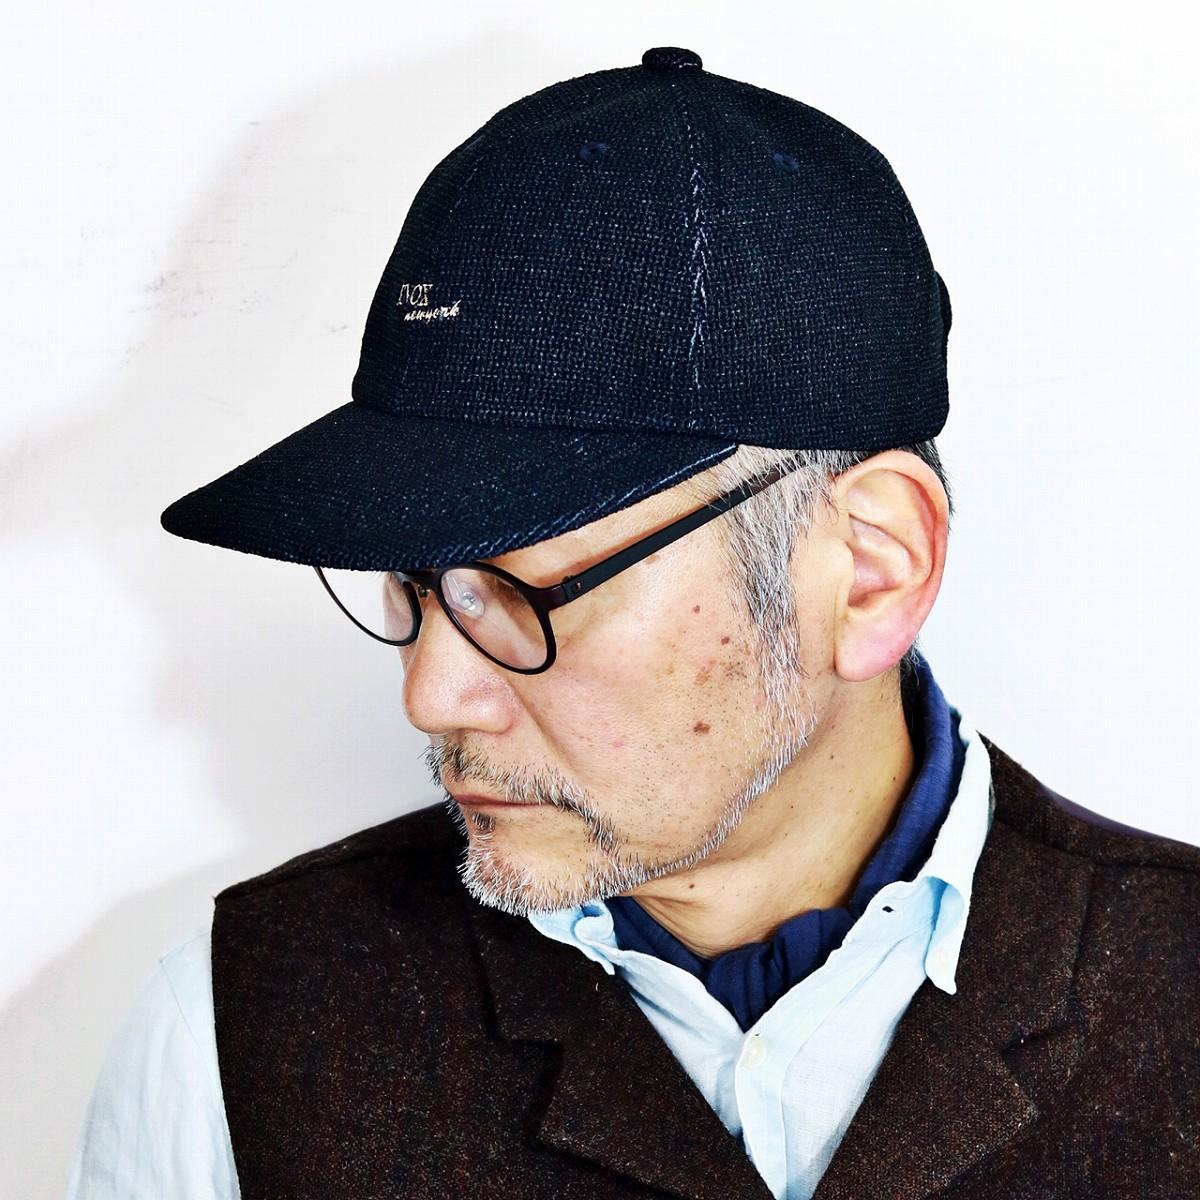 4390f6d6aca59 NEWYORK logo cap gentleman brand knit cap cold protection adjustable size dark  blue navy  cap  Christmas gift birthday present man hat mail order made in  ...